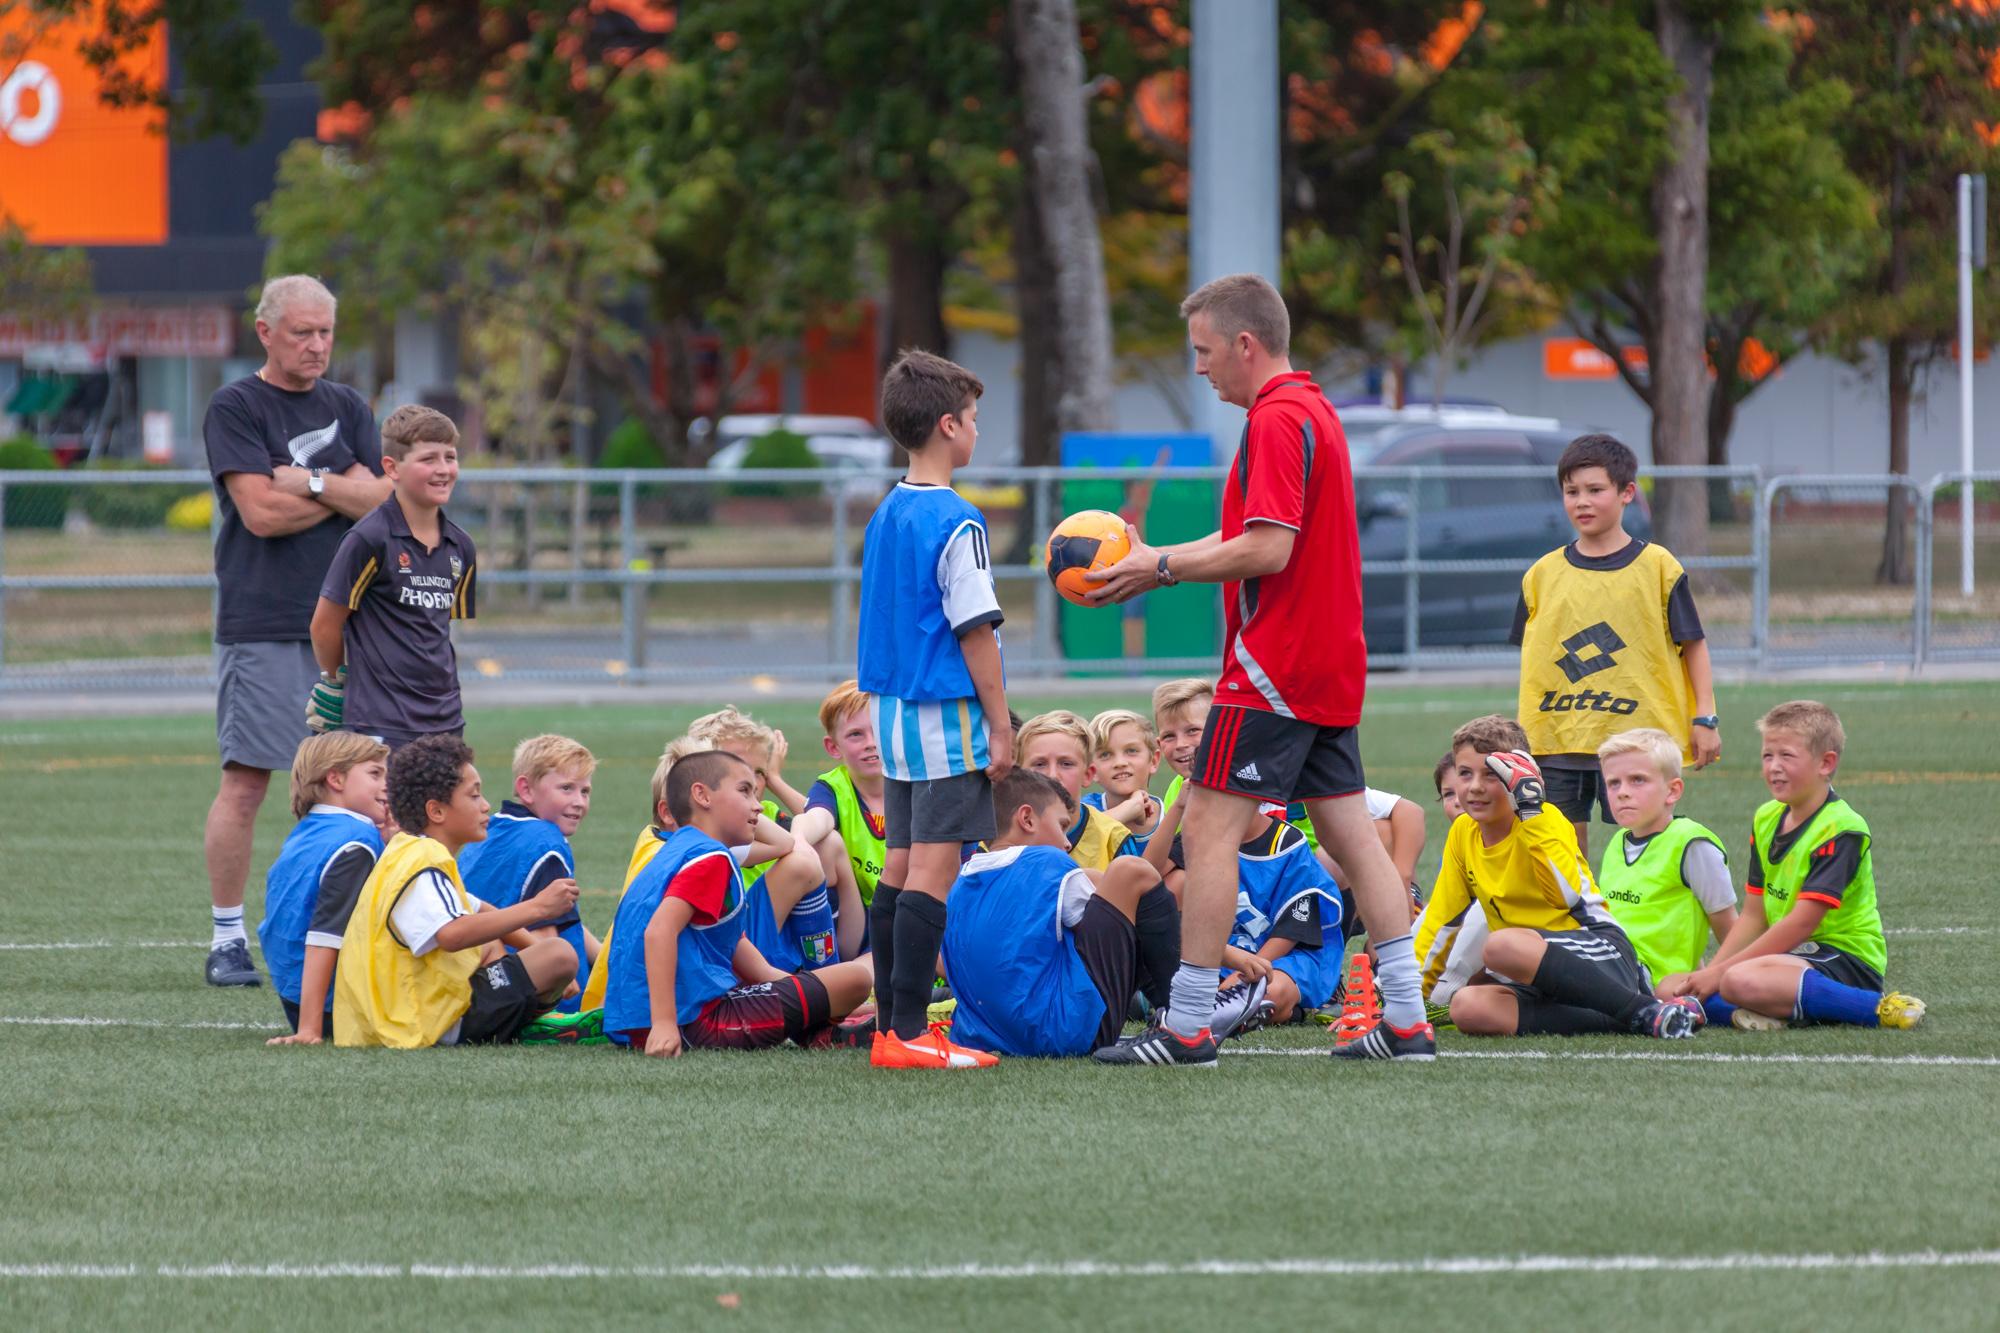 UHCC Soccer Coach 4494